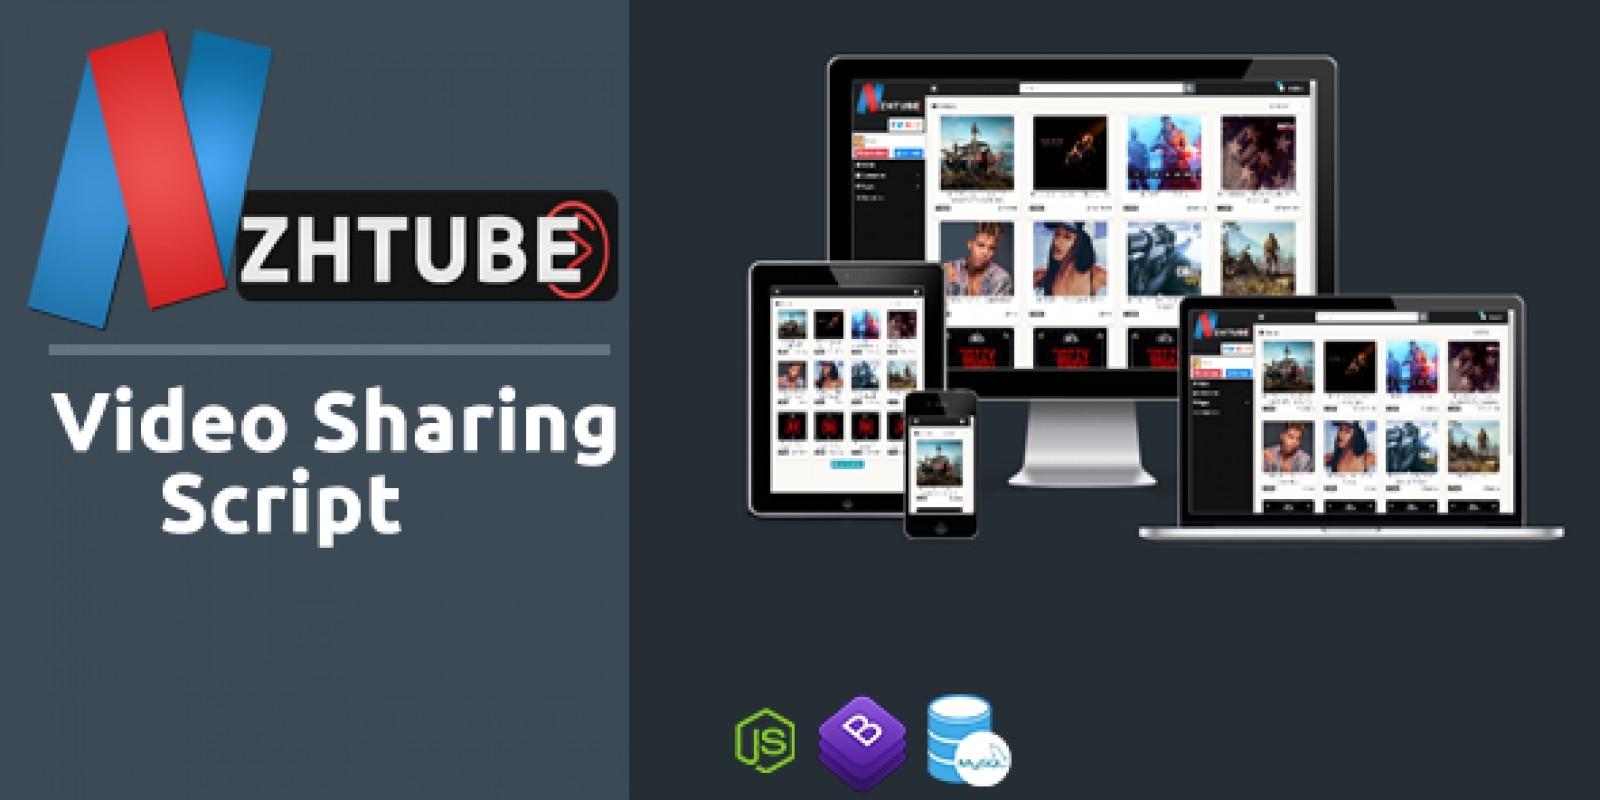 NazihTube Video Sharing Script - Node.js